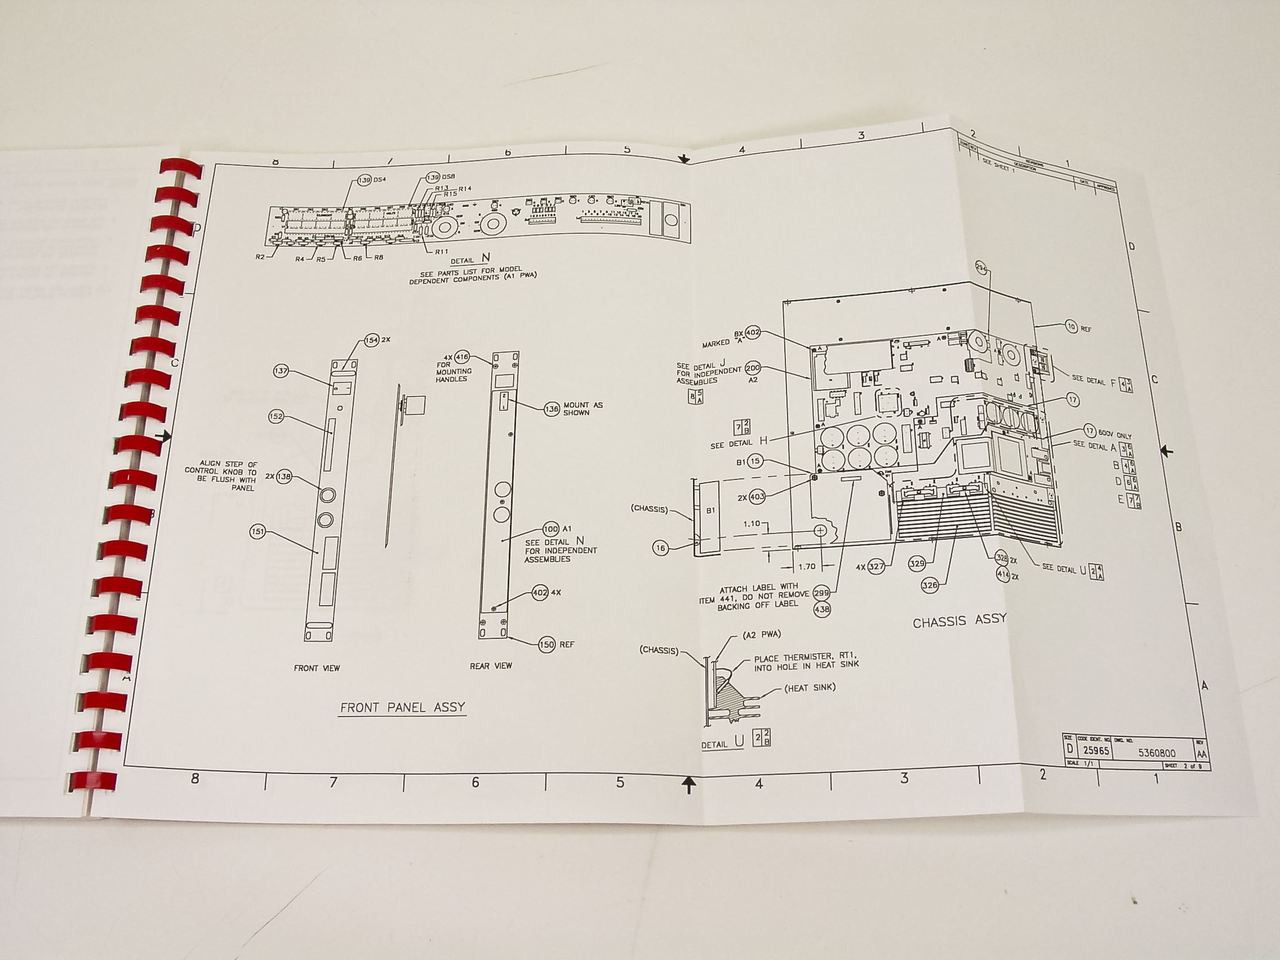 Ezgo Txt Wiring Diagram Dcs | Wiring Liry Dcs Ezgo Headlight Wiring Diagram on